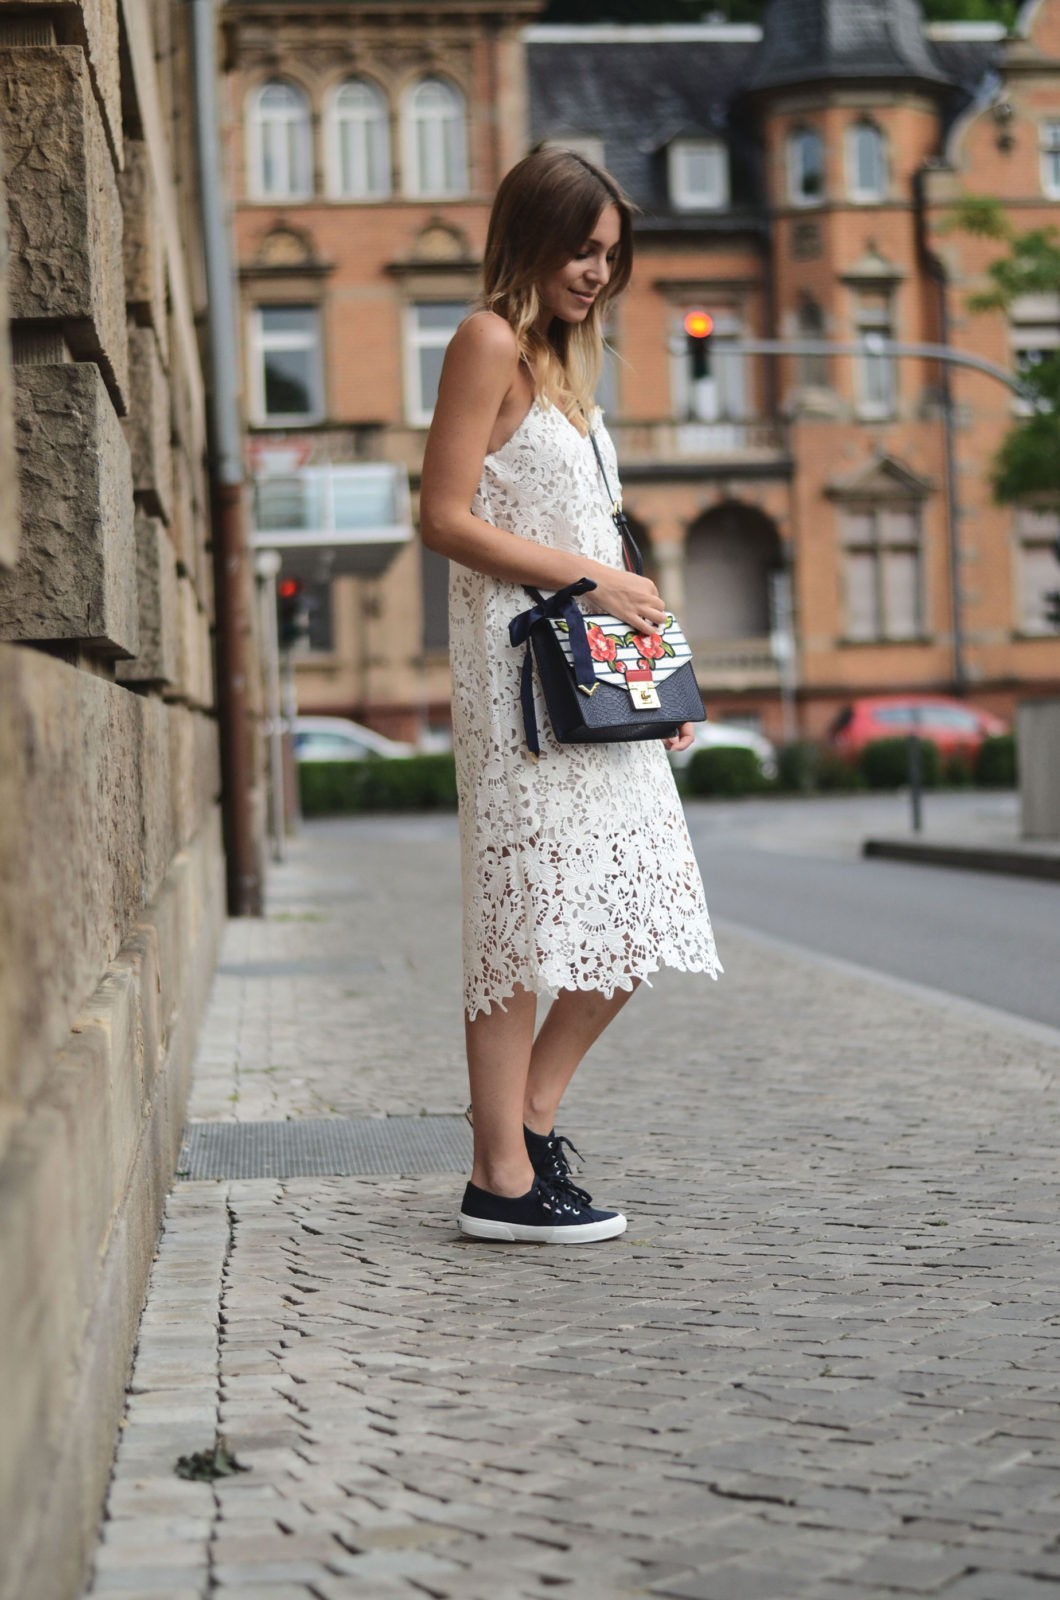 sariety modeblog heidelberg sarah czok fashionblogger zara spitzenkleid superga aldo bag 3 sariety. Black Bedroom Furniture Sets. Home Design Ideas